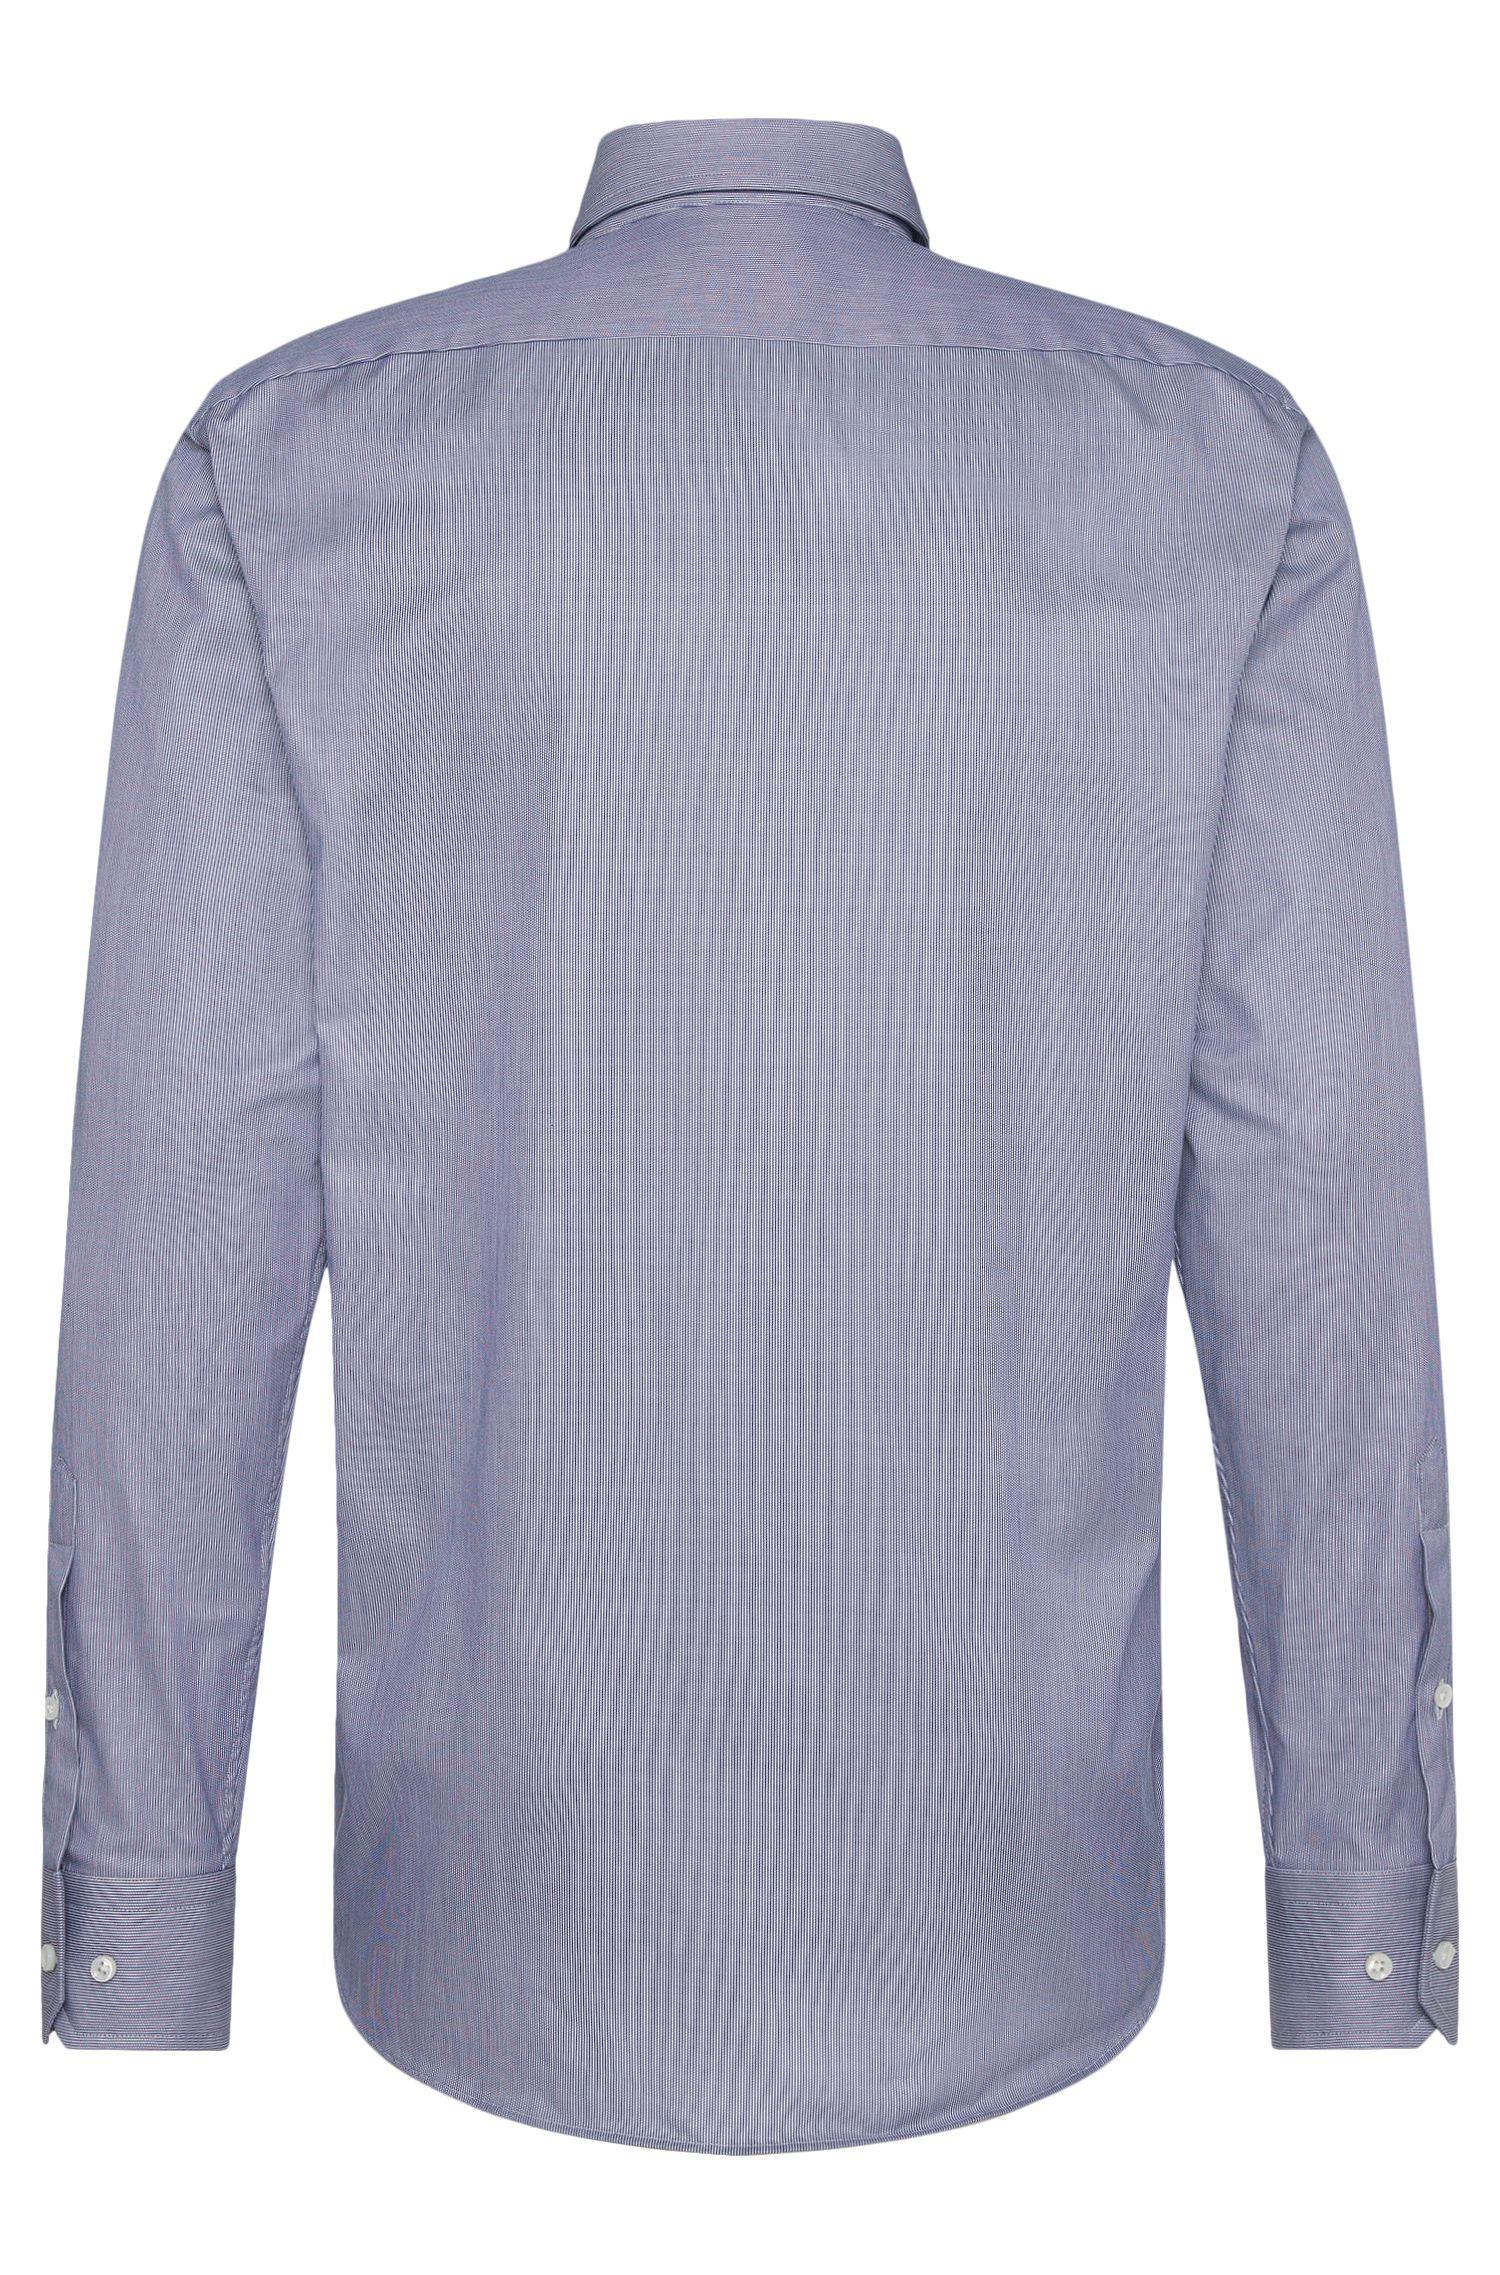 Gestreiftes Regular-Fit Tailored Hemd aus Baumwolle: 'T-Stuart'